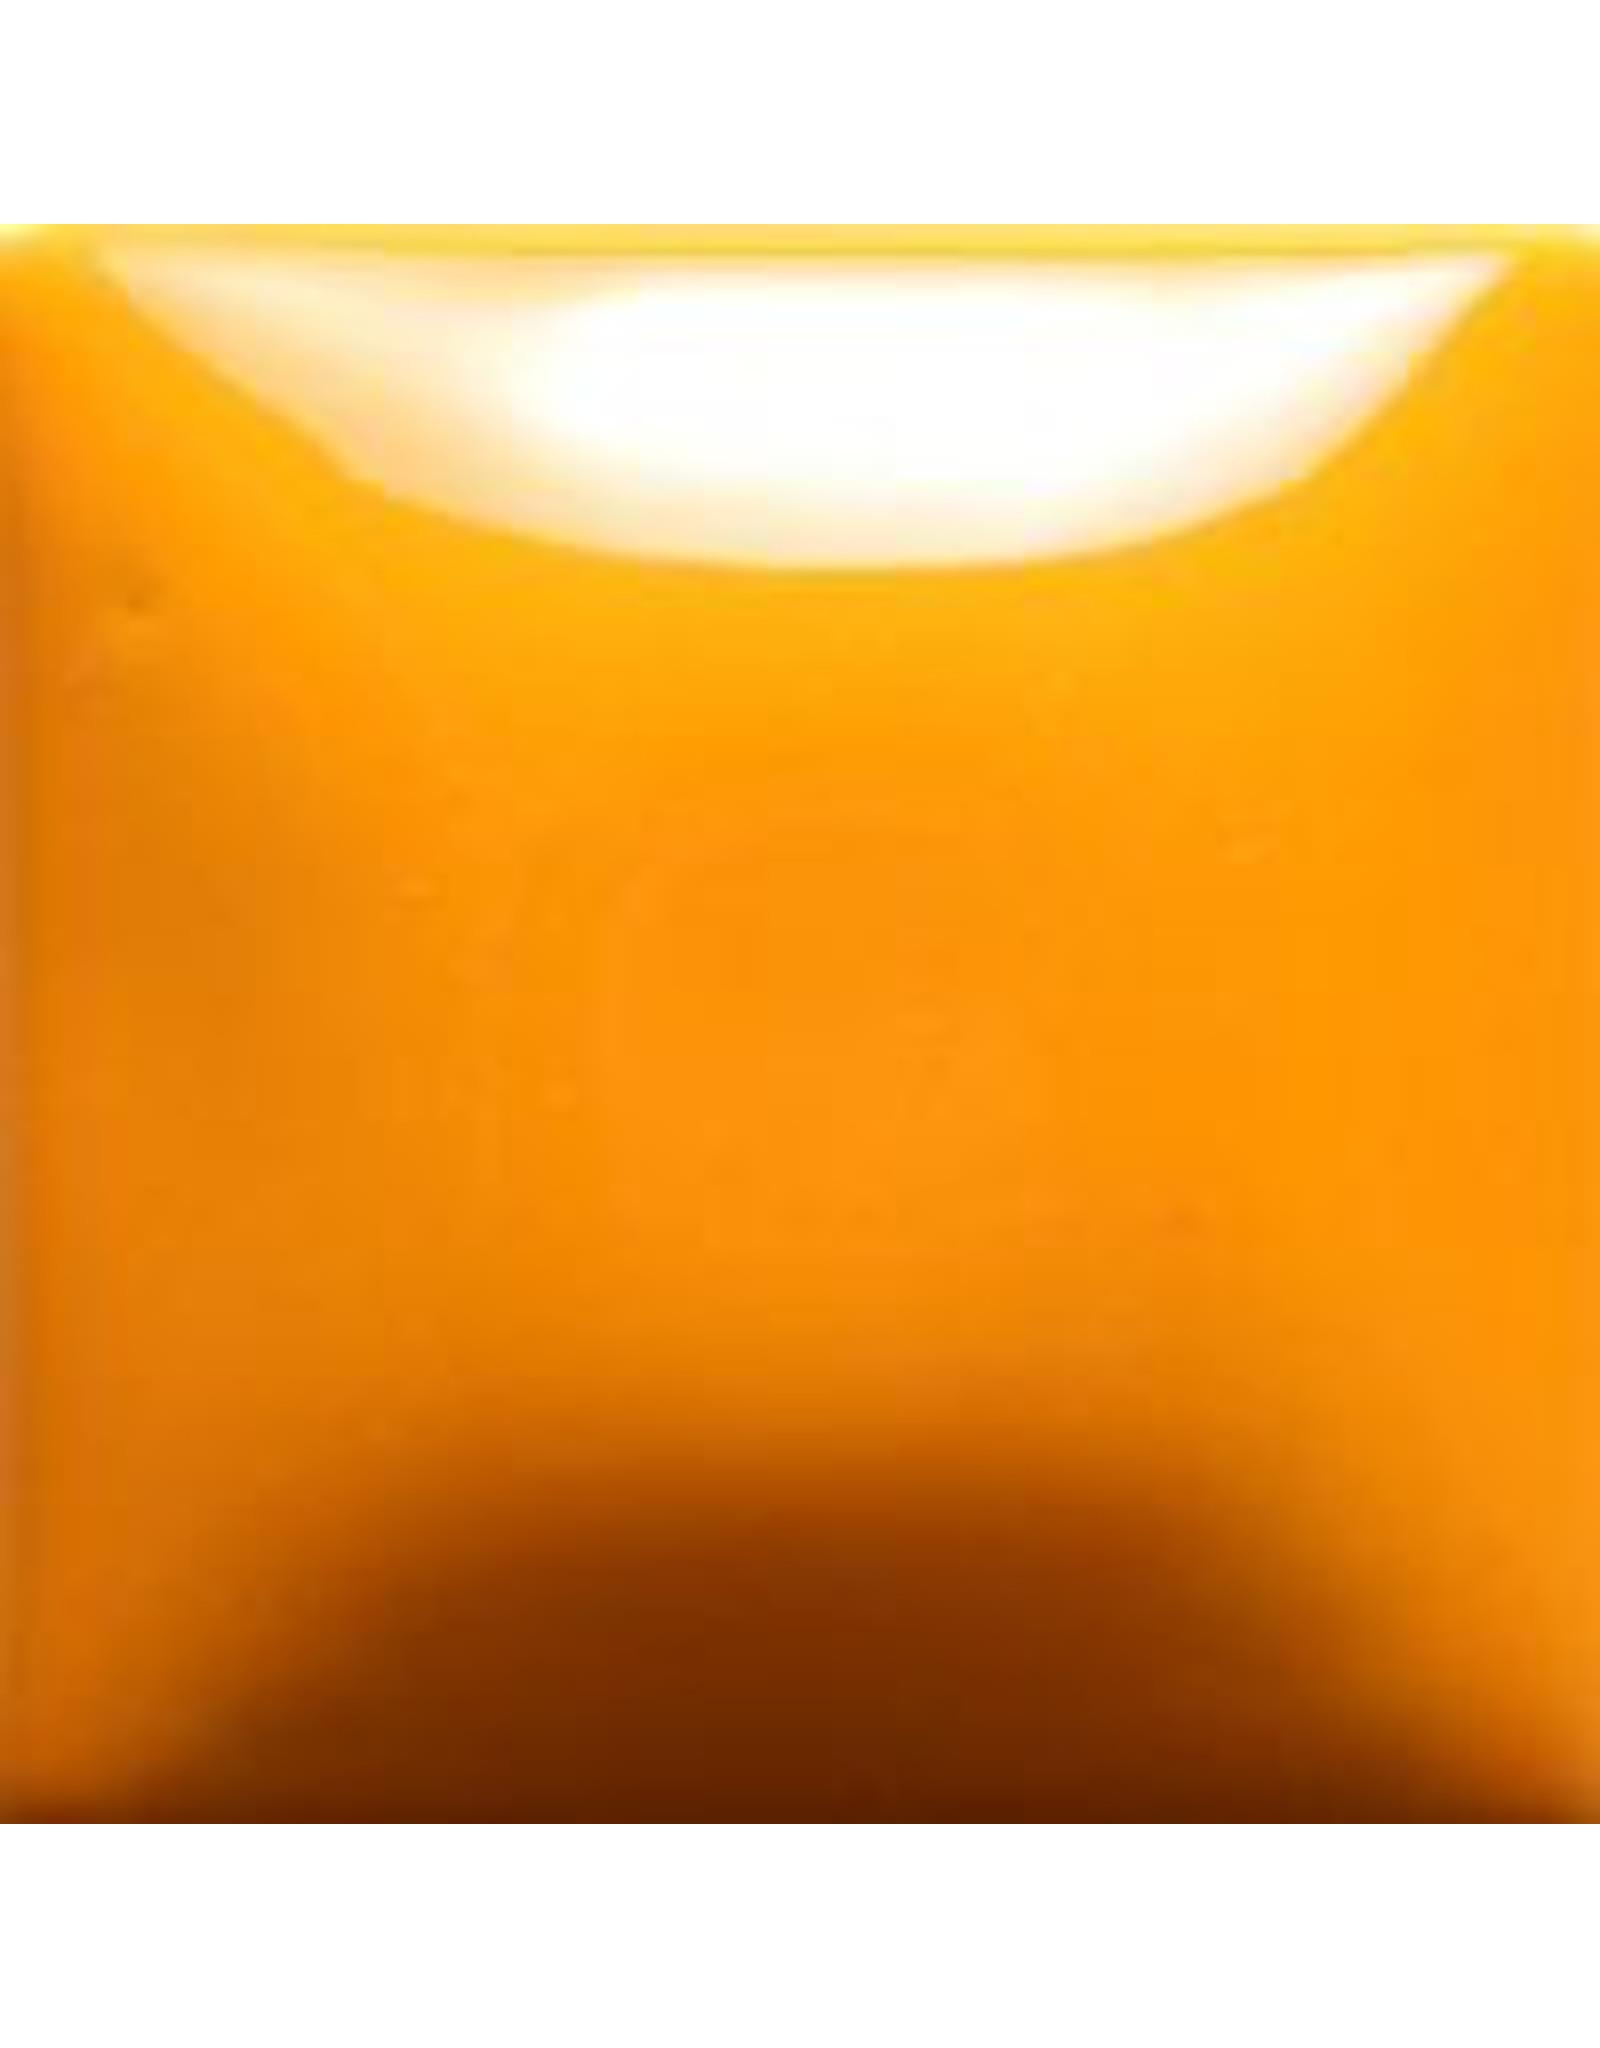 Mayco Mayco Foundations Tangerine 118ml